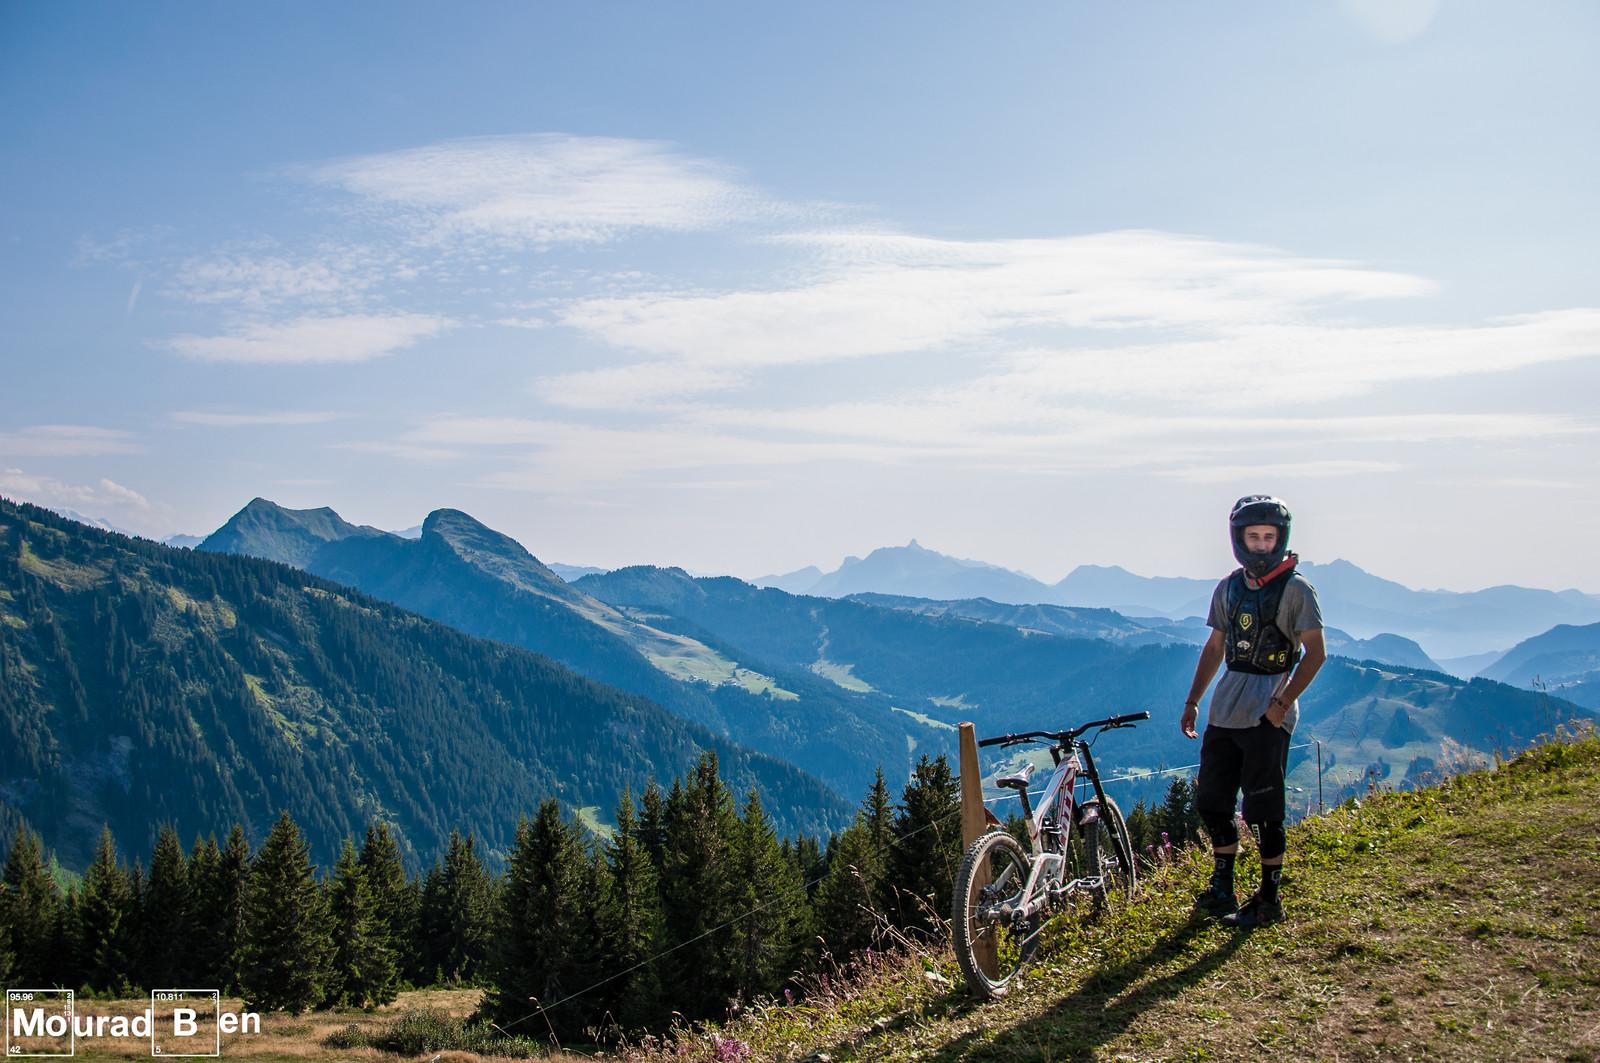 Paradise - Romuald_Manach - Mountain Biking Pictures - Vital MTB